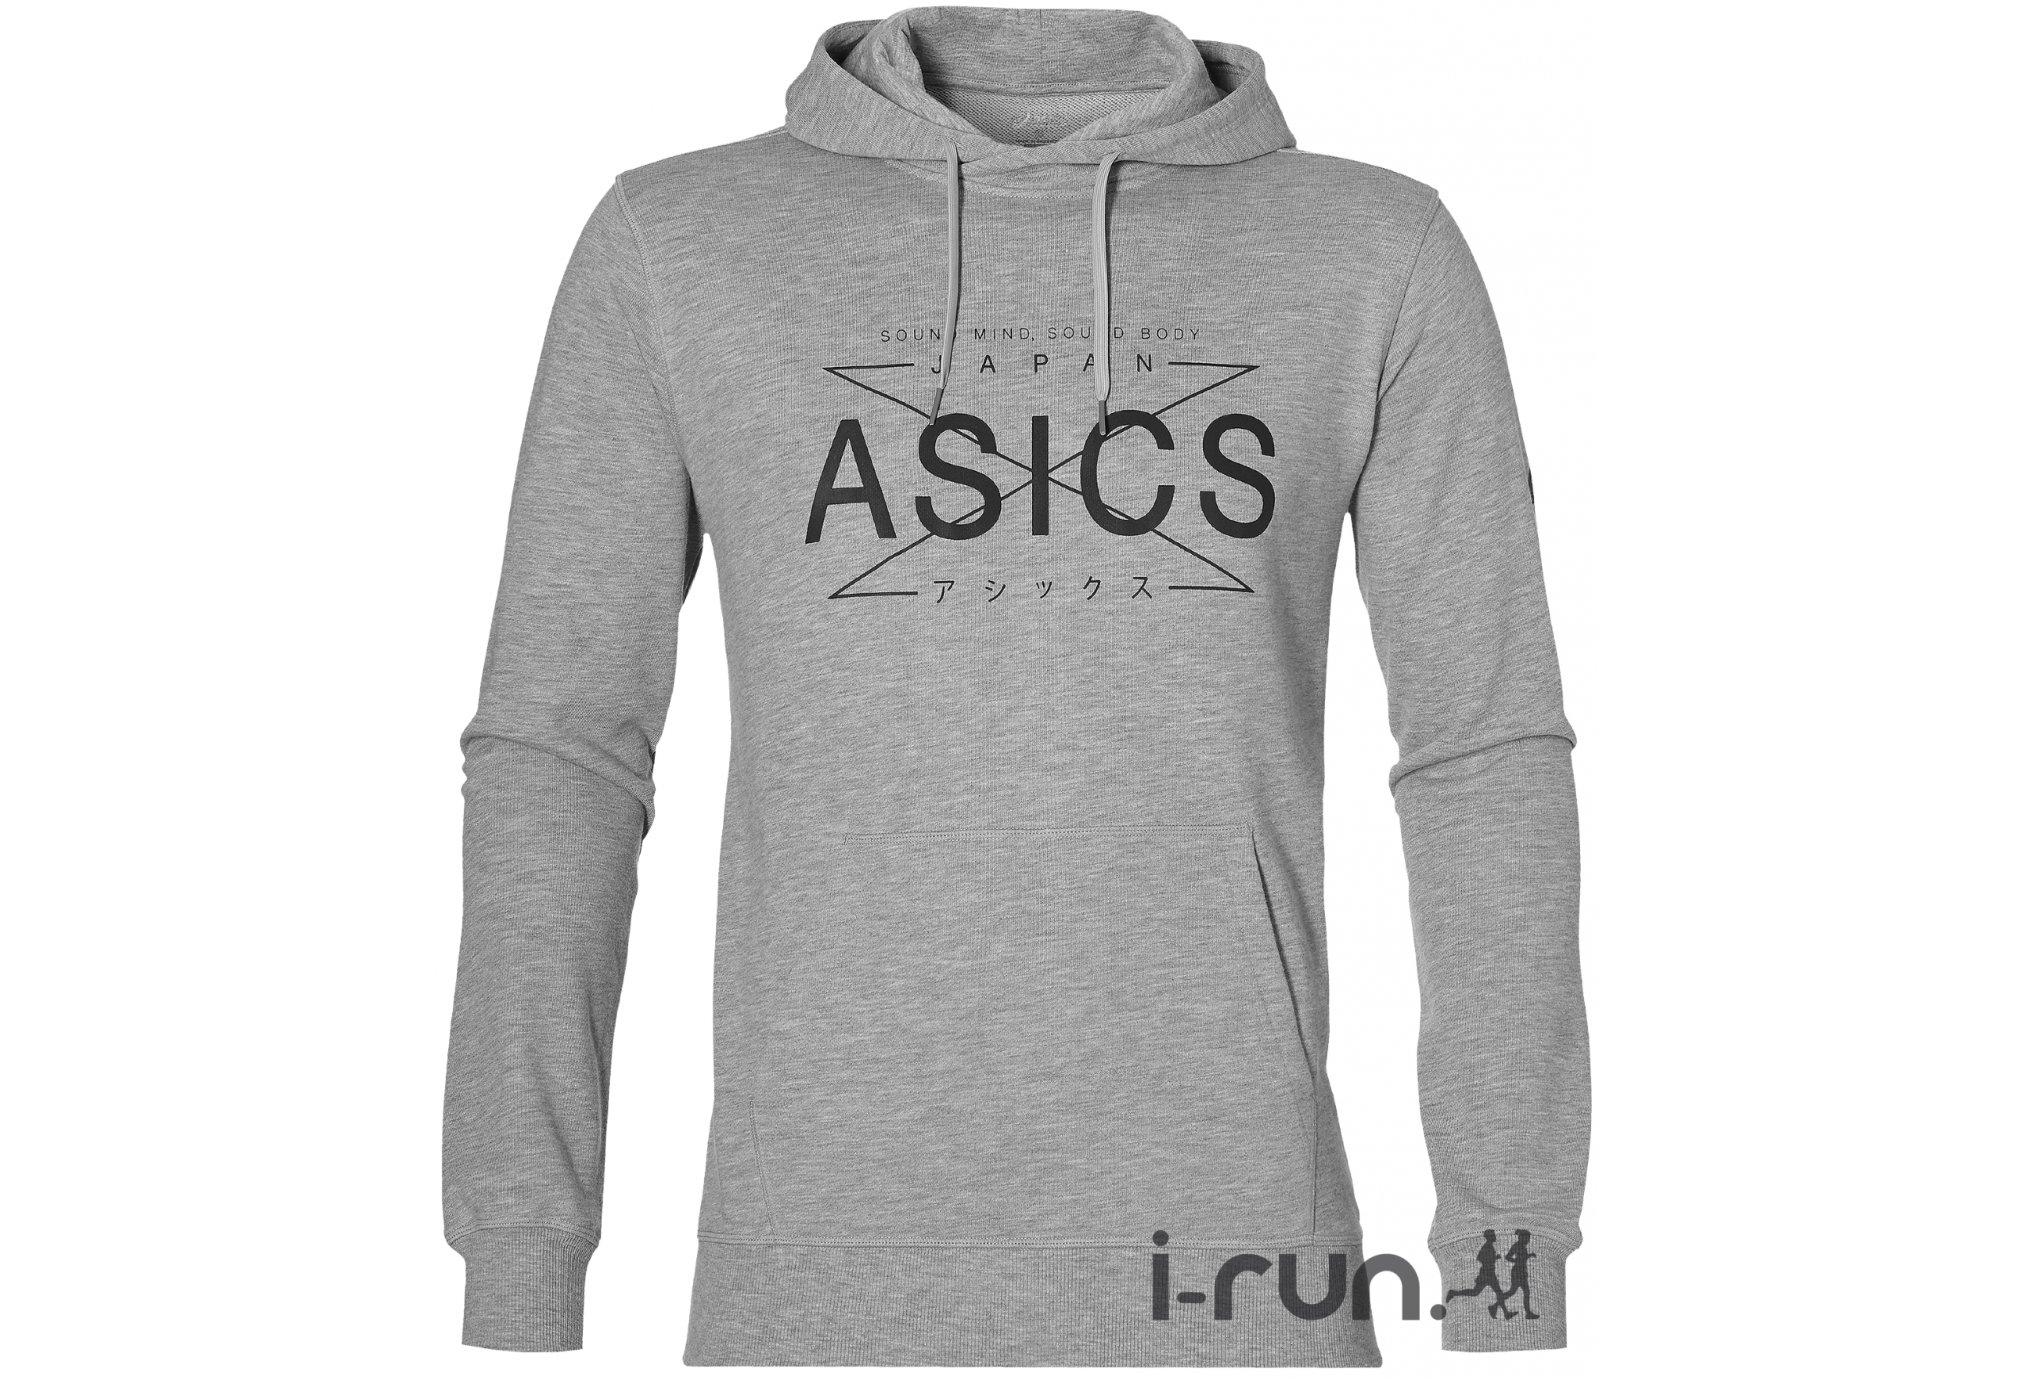 Asics Graphic Hoody M vêtement running homme